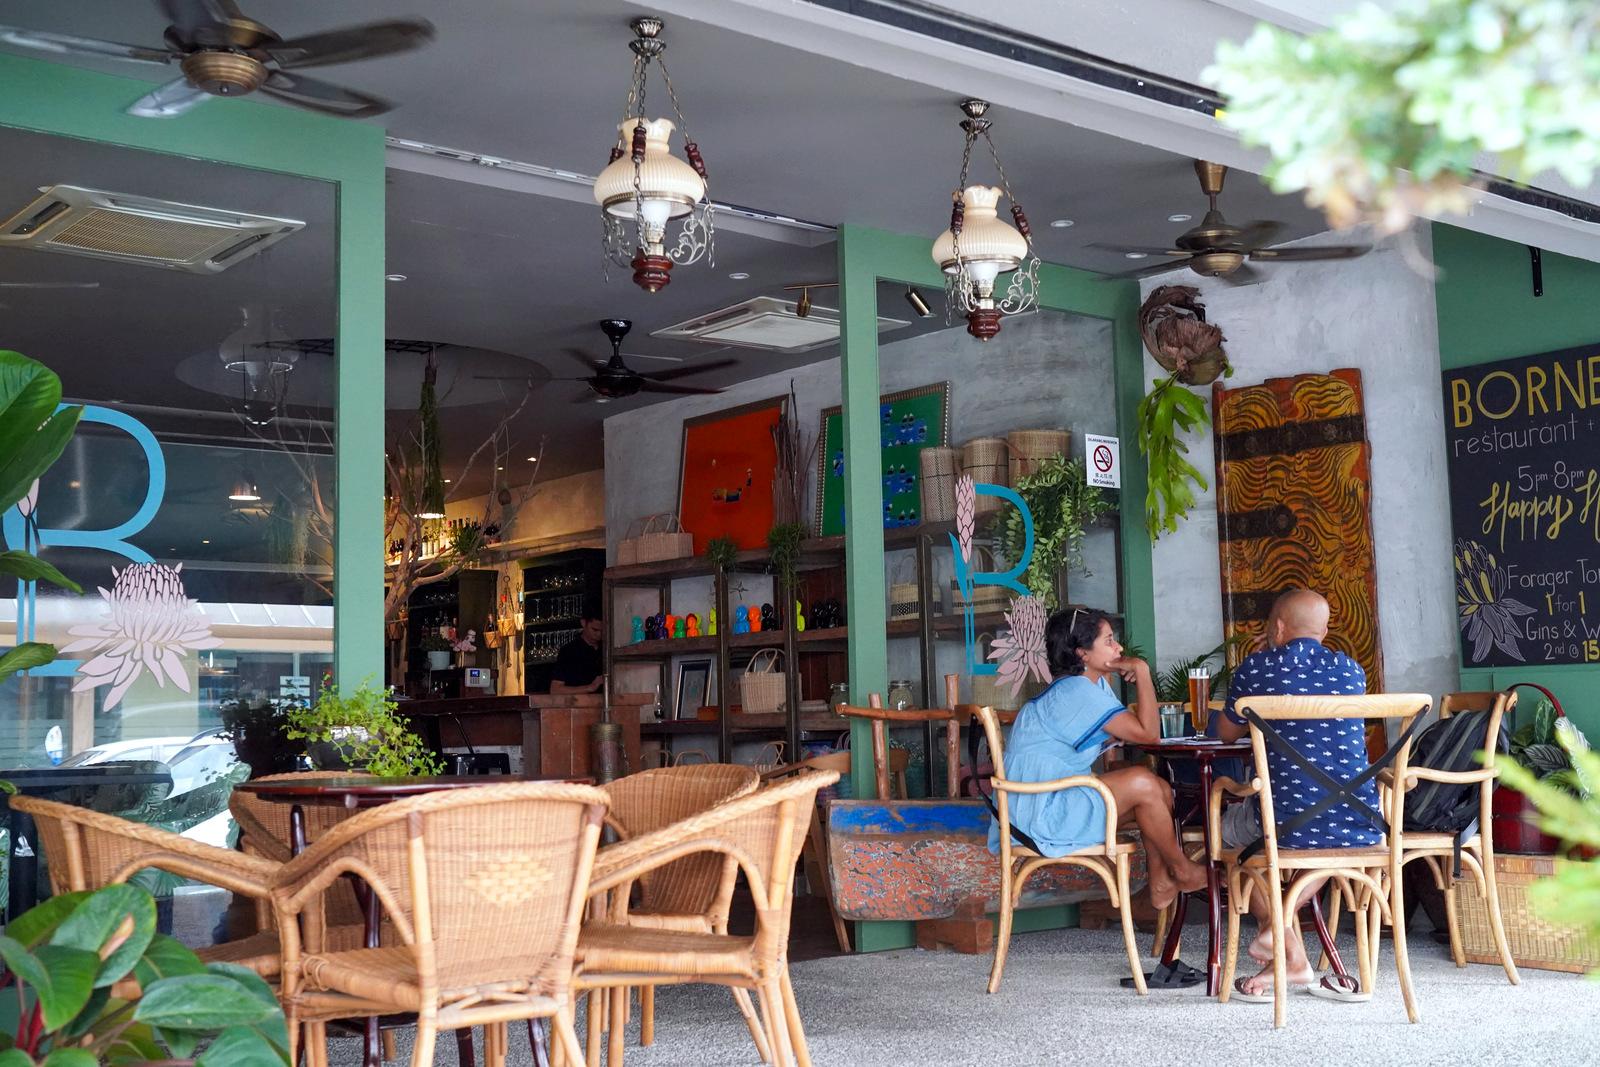 borneo restaurant & bar, bangsar